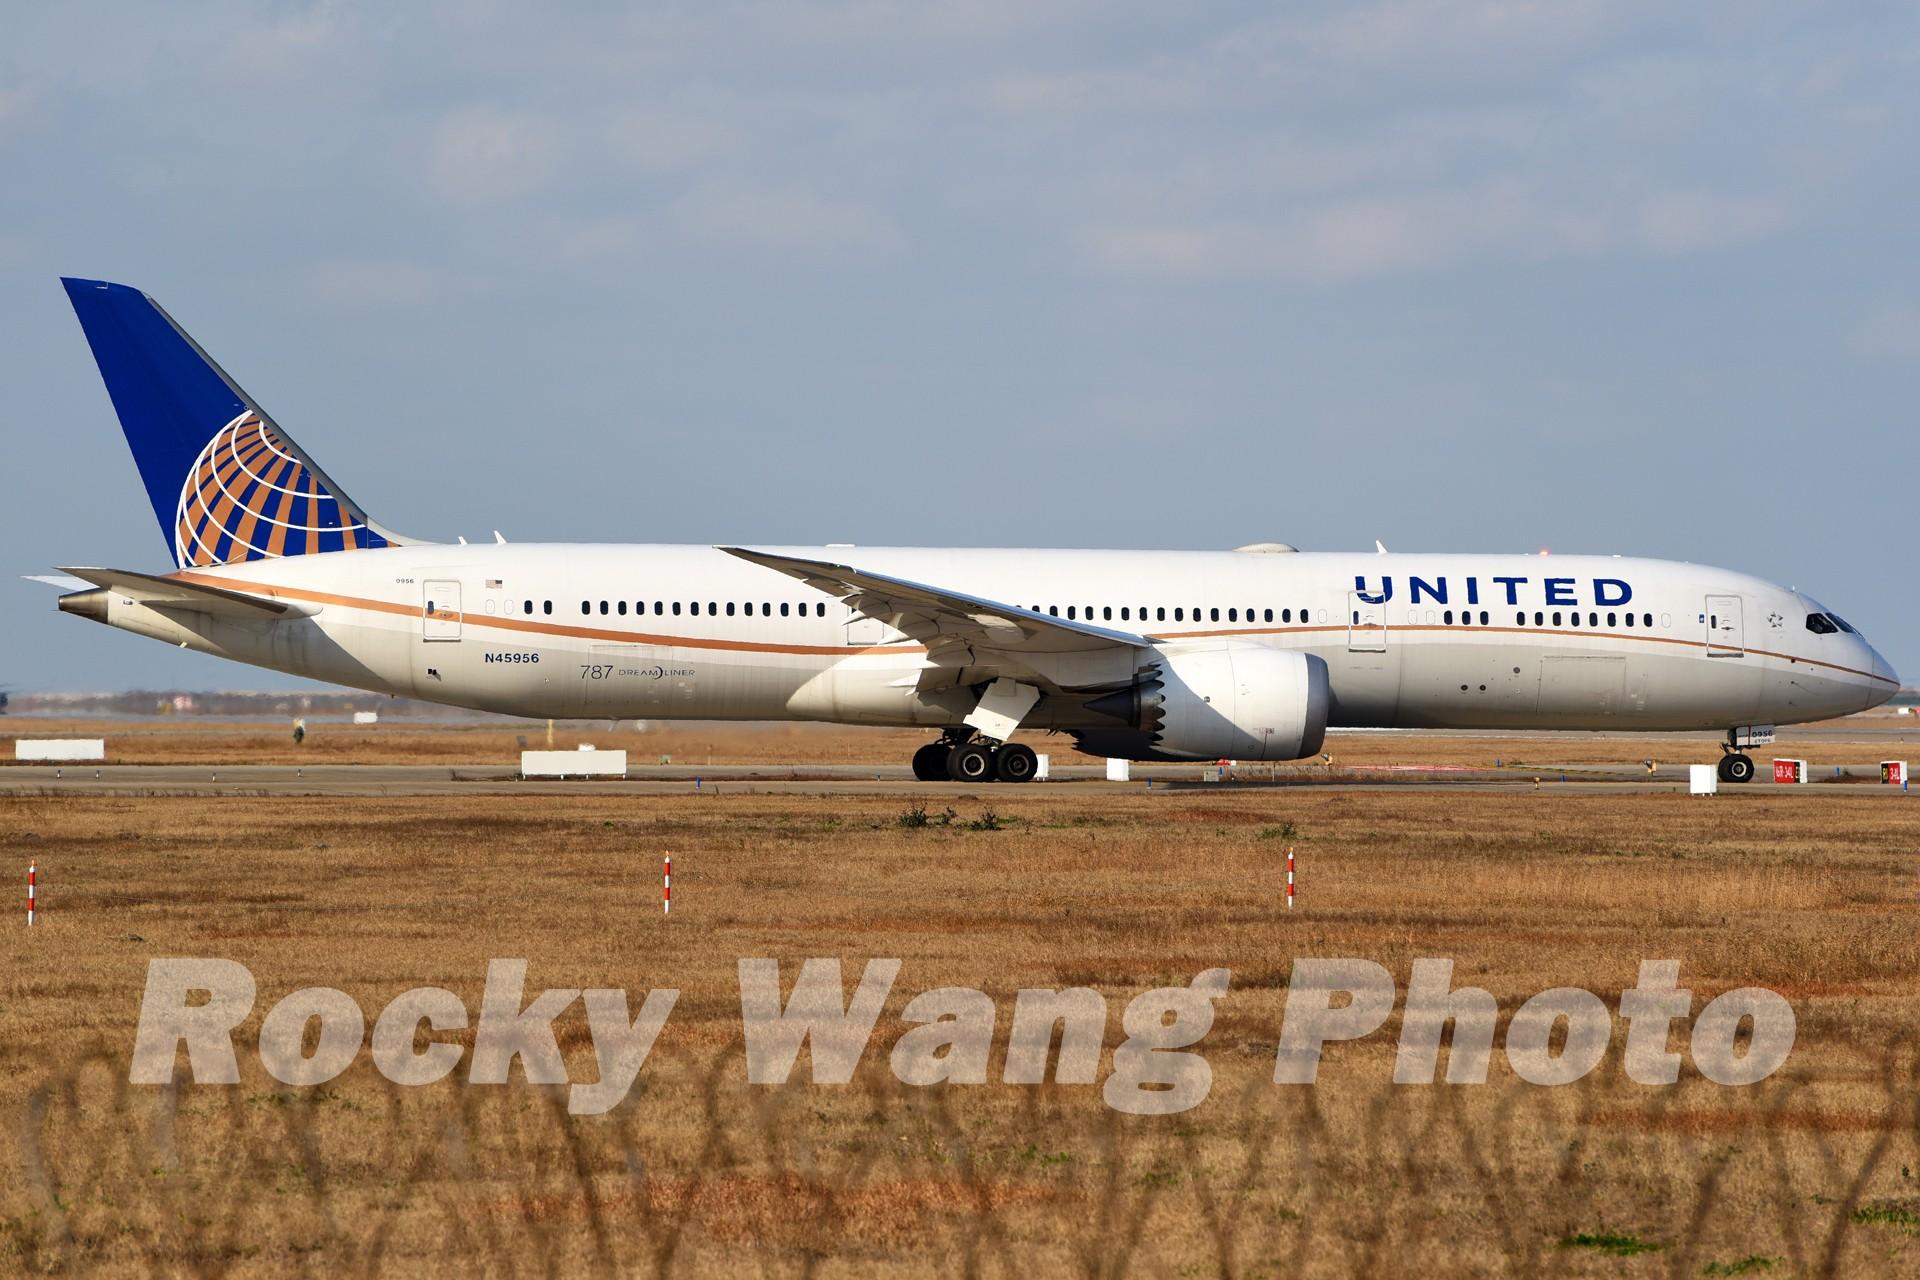 Re:[原创]即将离开787级,刷一组787 BOEING 787-9 N45956 中国上海浦东国际机场